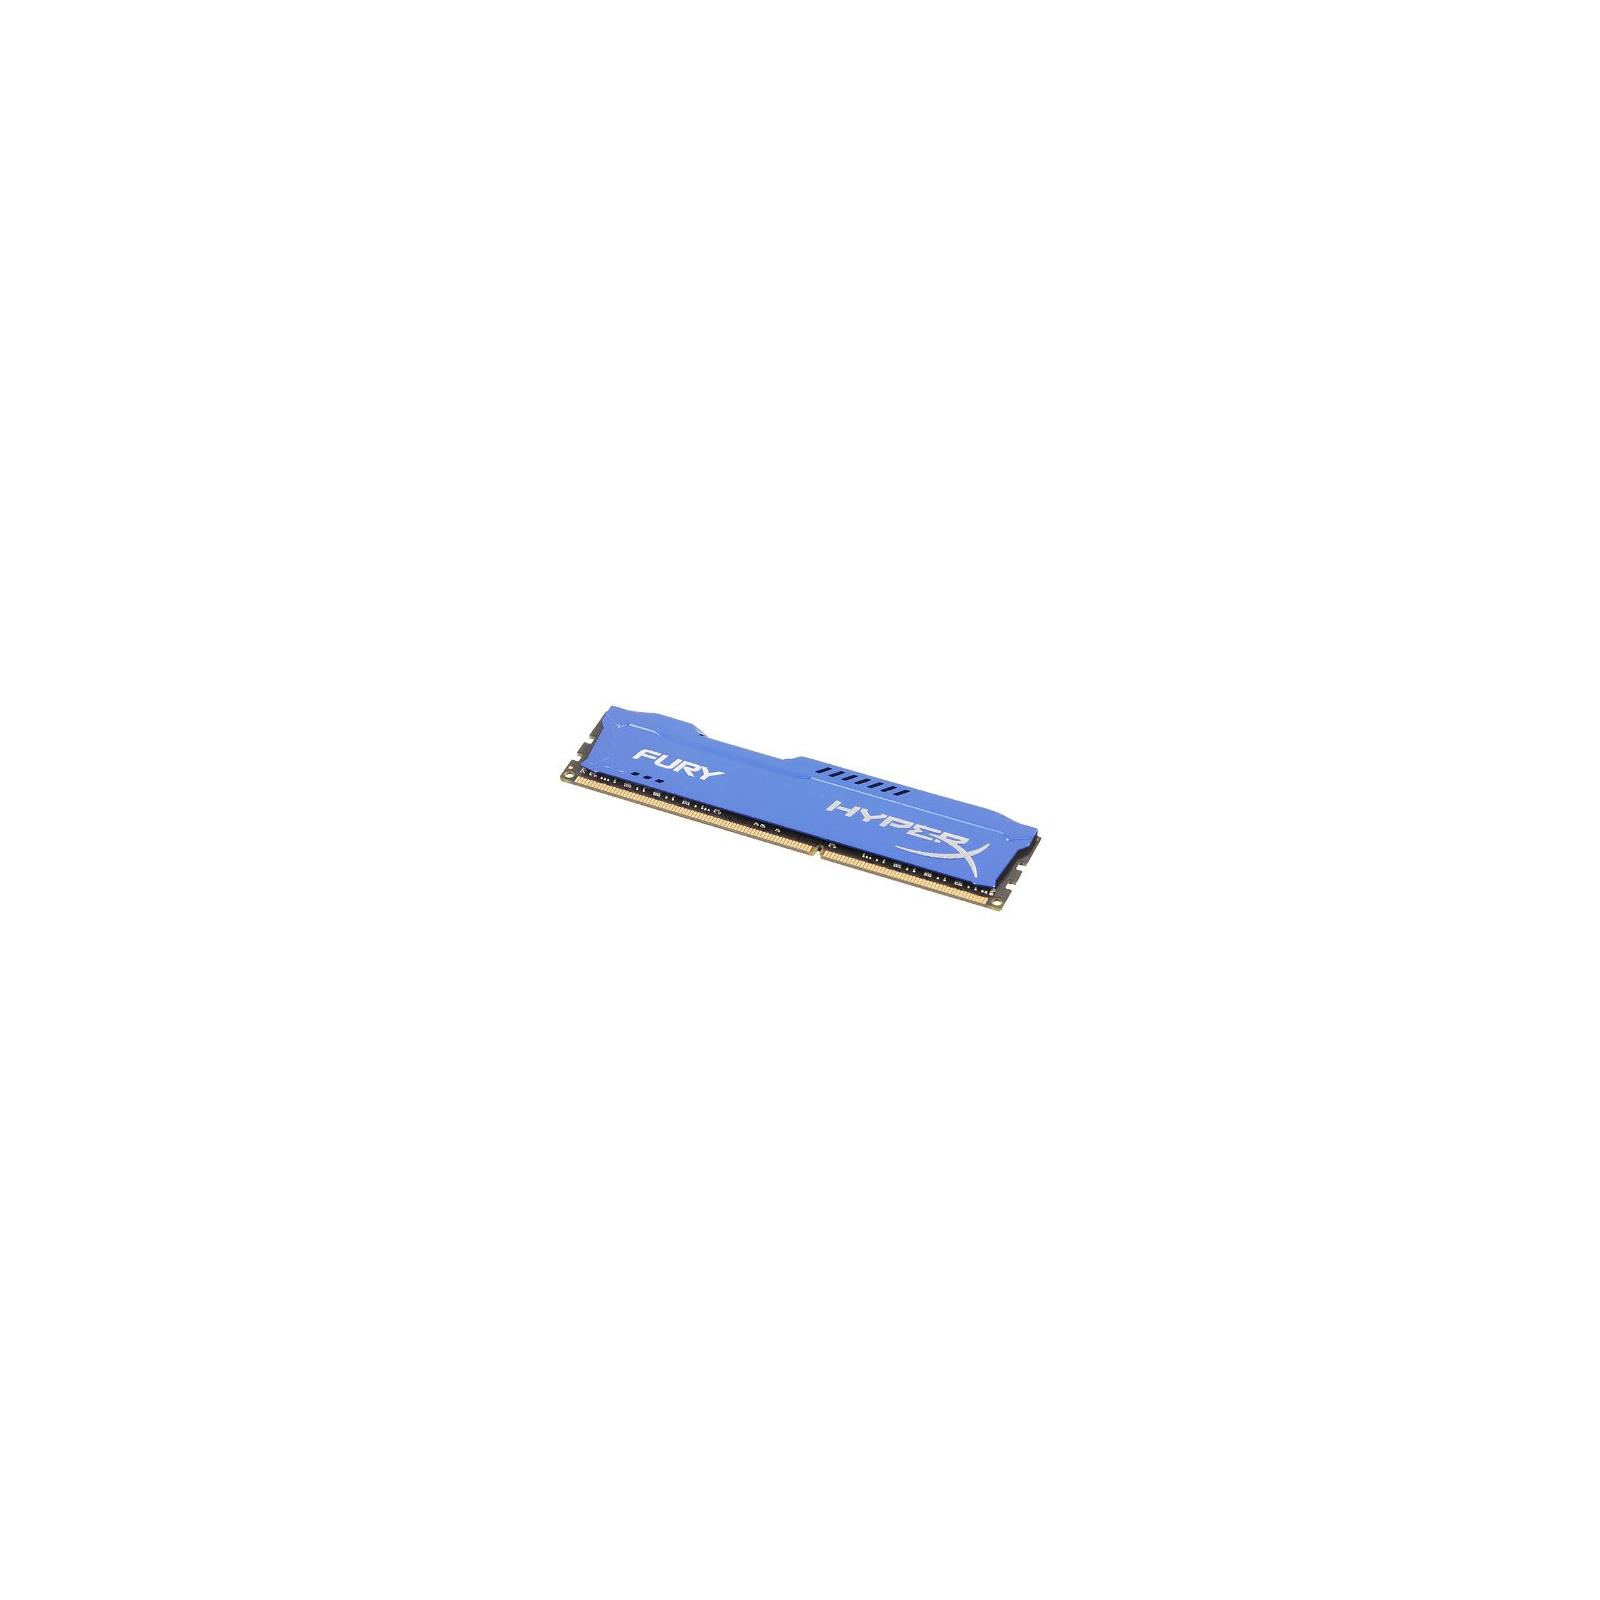 Модуль памяти для компьютера DDR3 8Gb 1600 MHz HyperX Fury Blu Kingston (HX316C10F/8) изображение 4